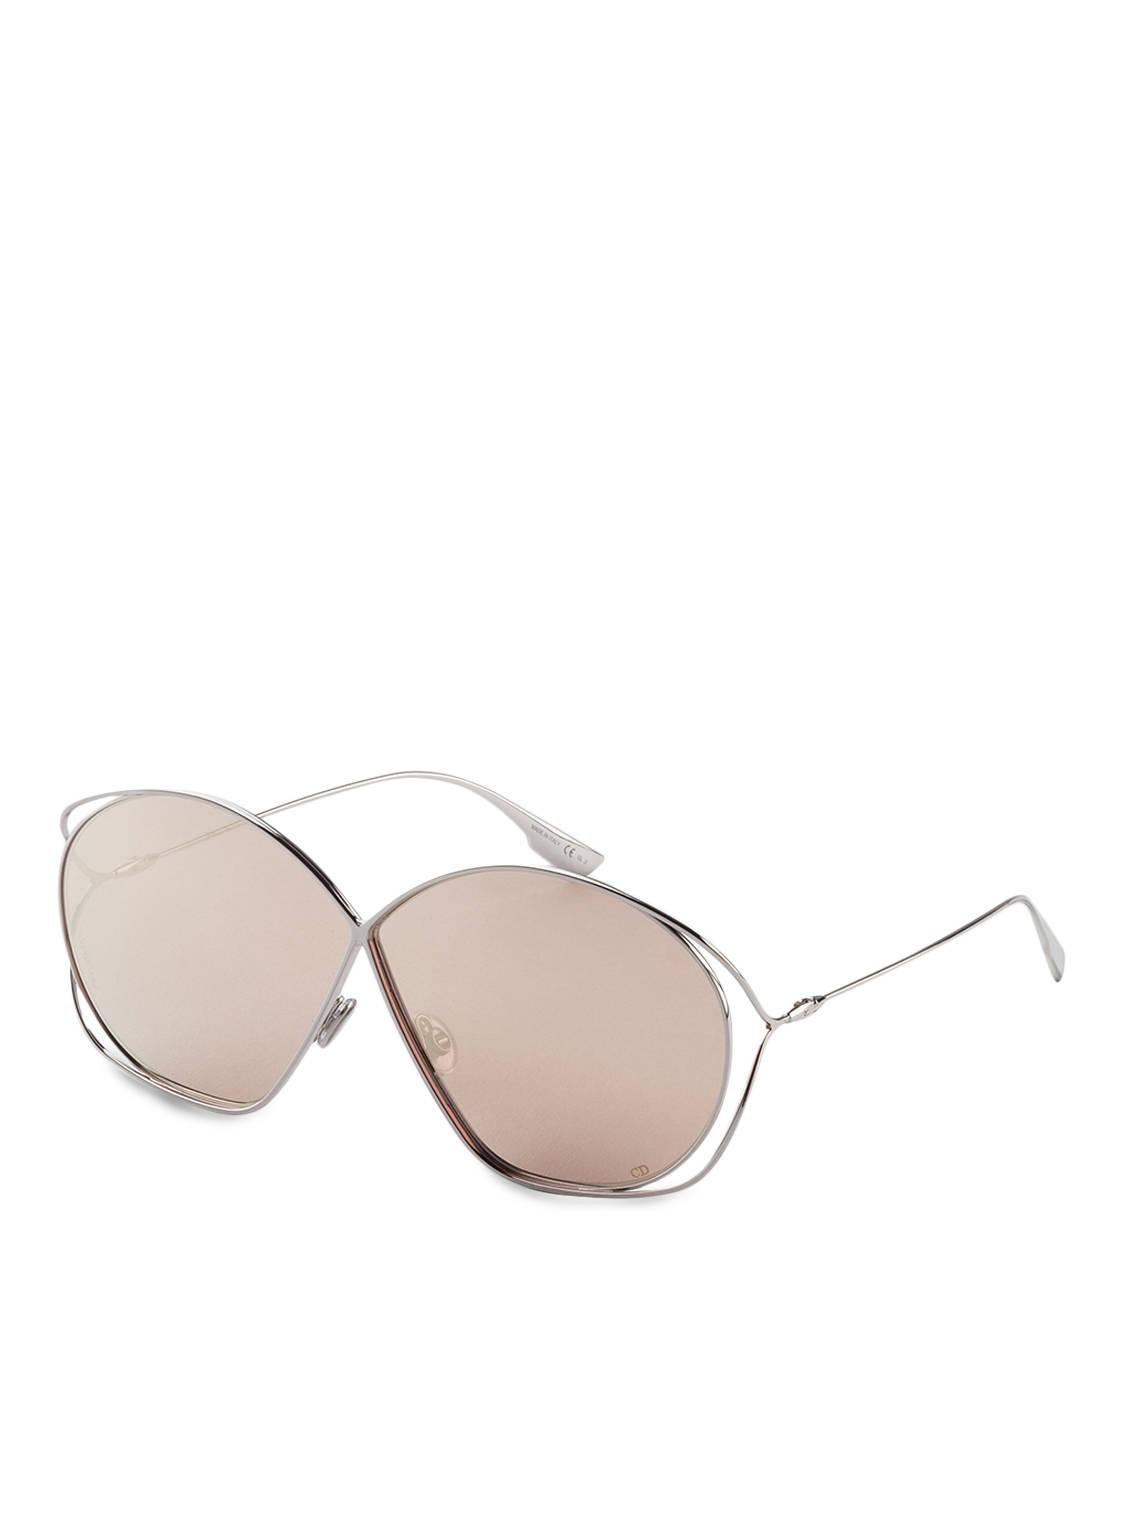 Sunglasses Sonnenbrille DIOR STELLAIRE 2